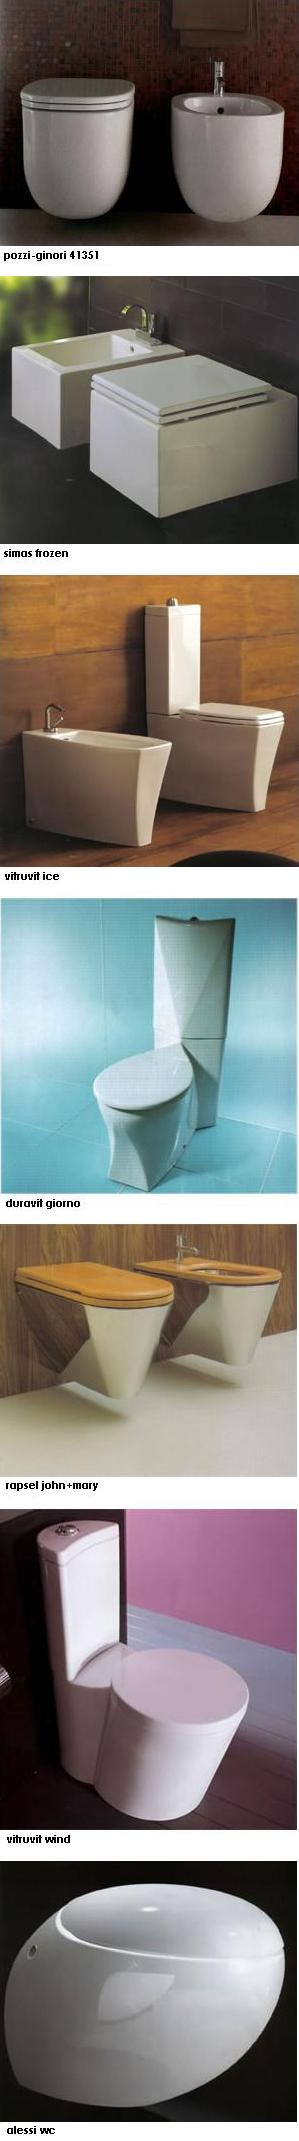 European Toilet Design - the latest trends on Model Toilet Design  id=85046